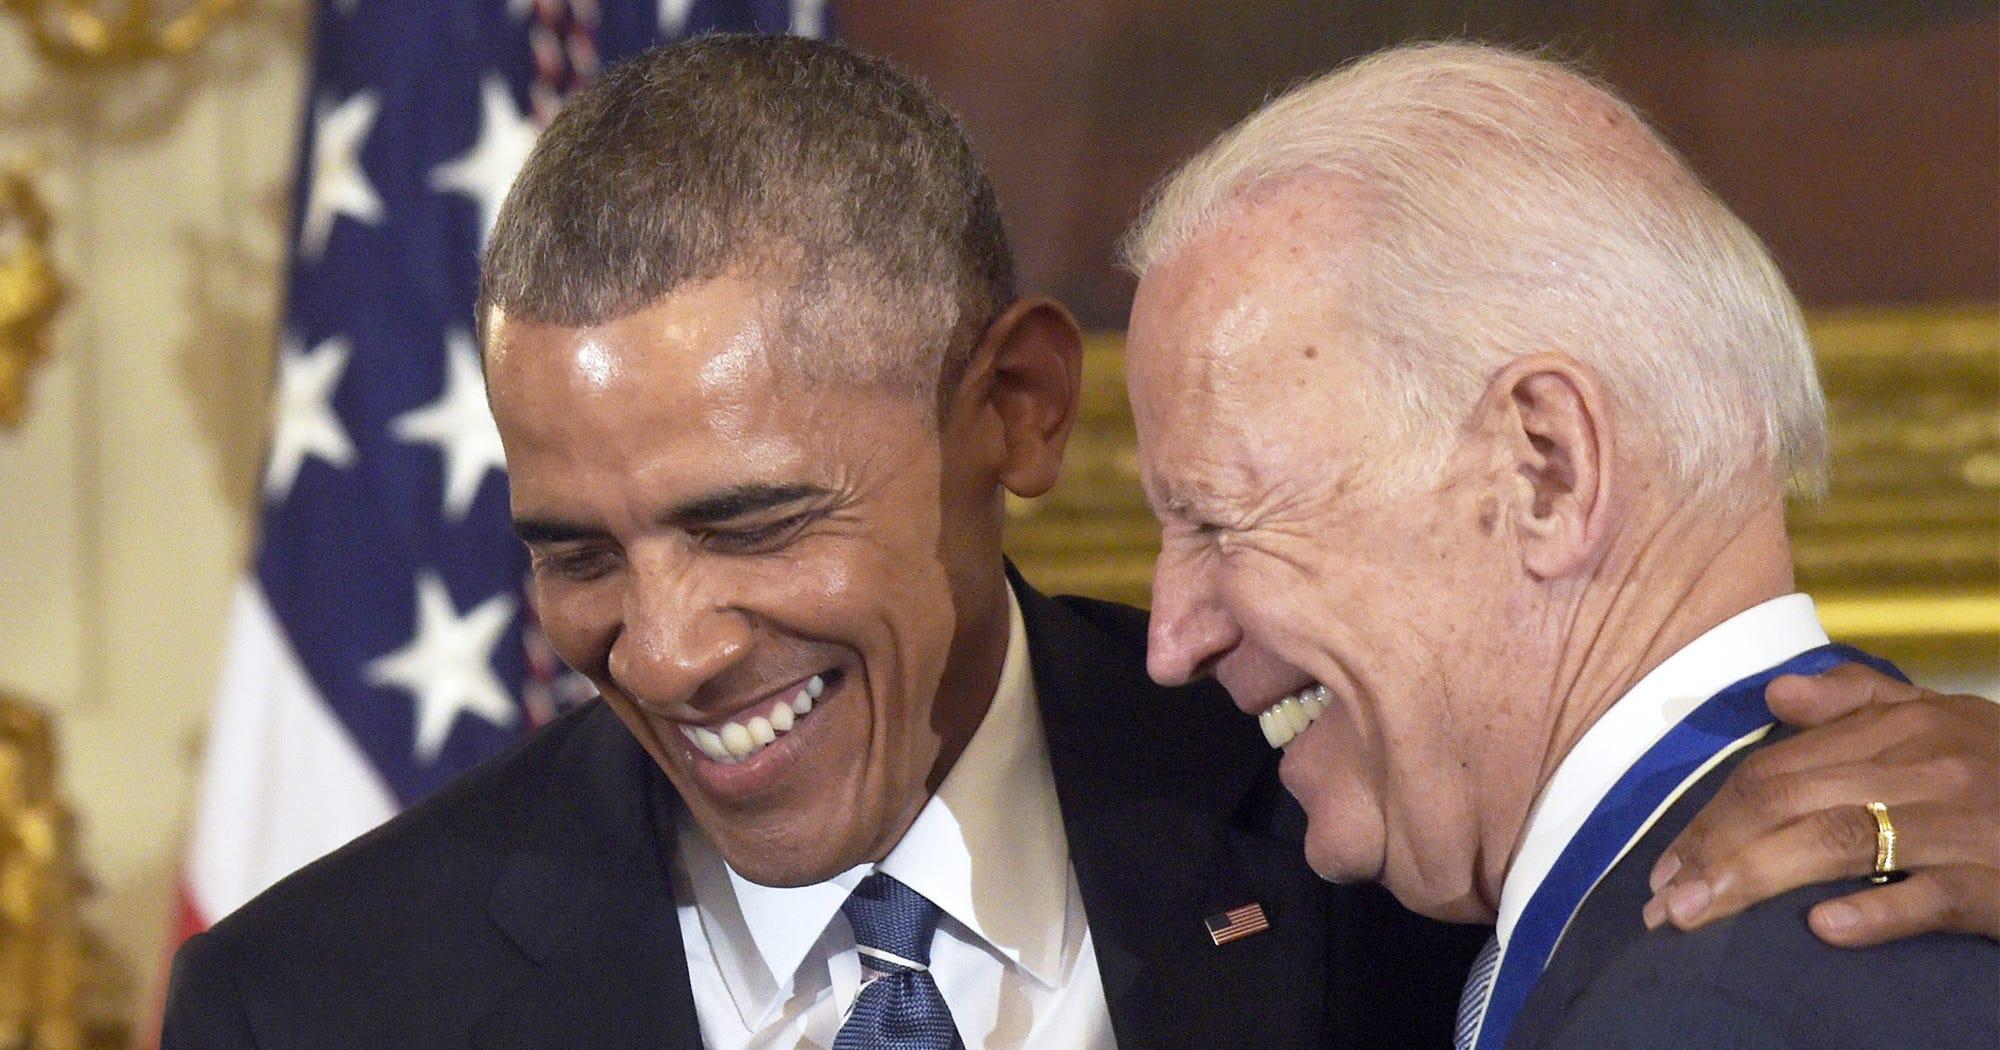 Barack Obama biden photo gallery